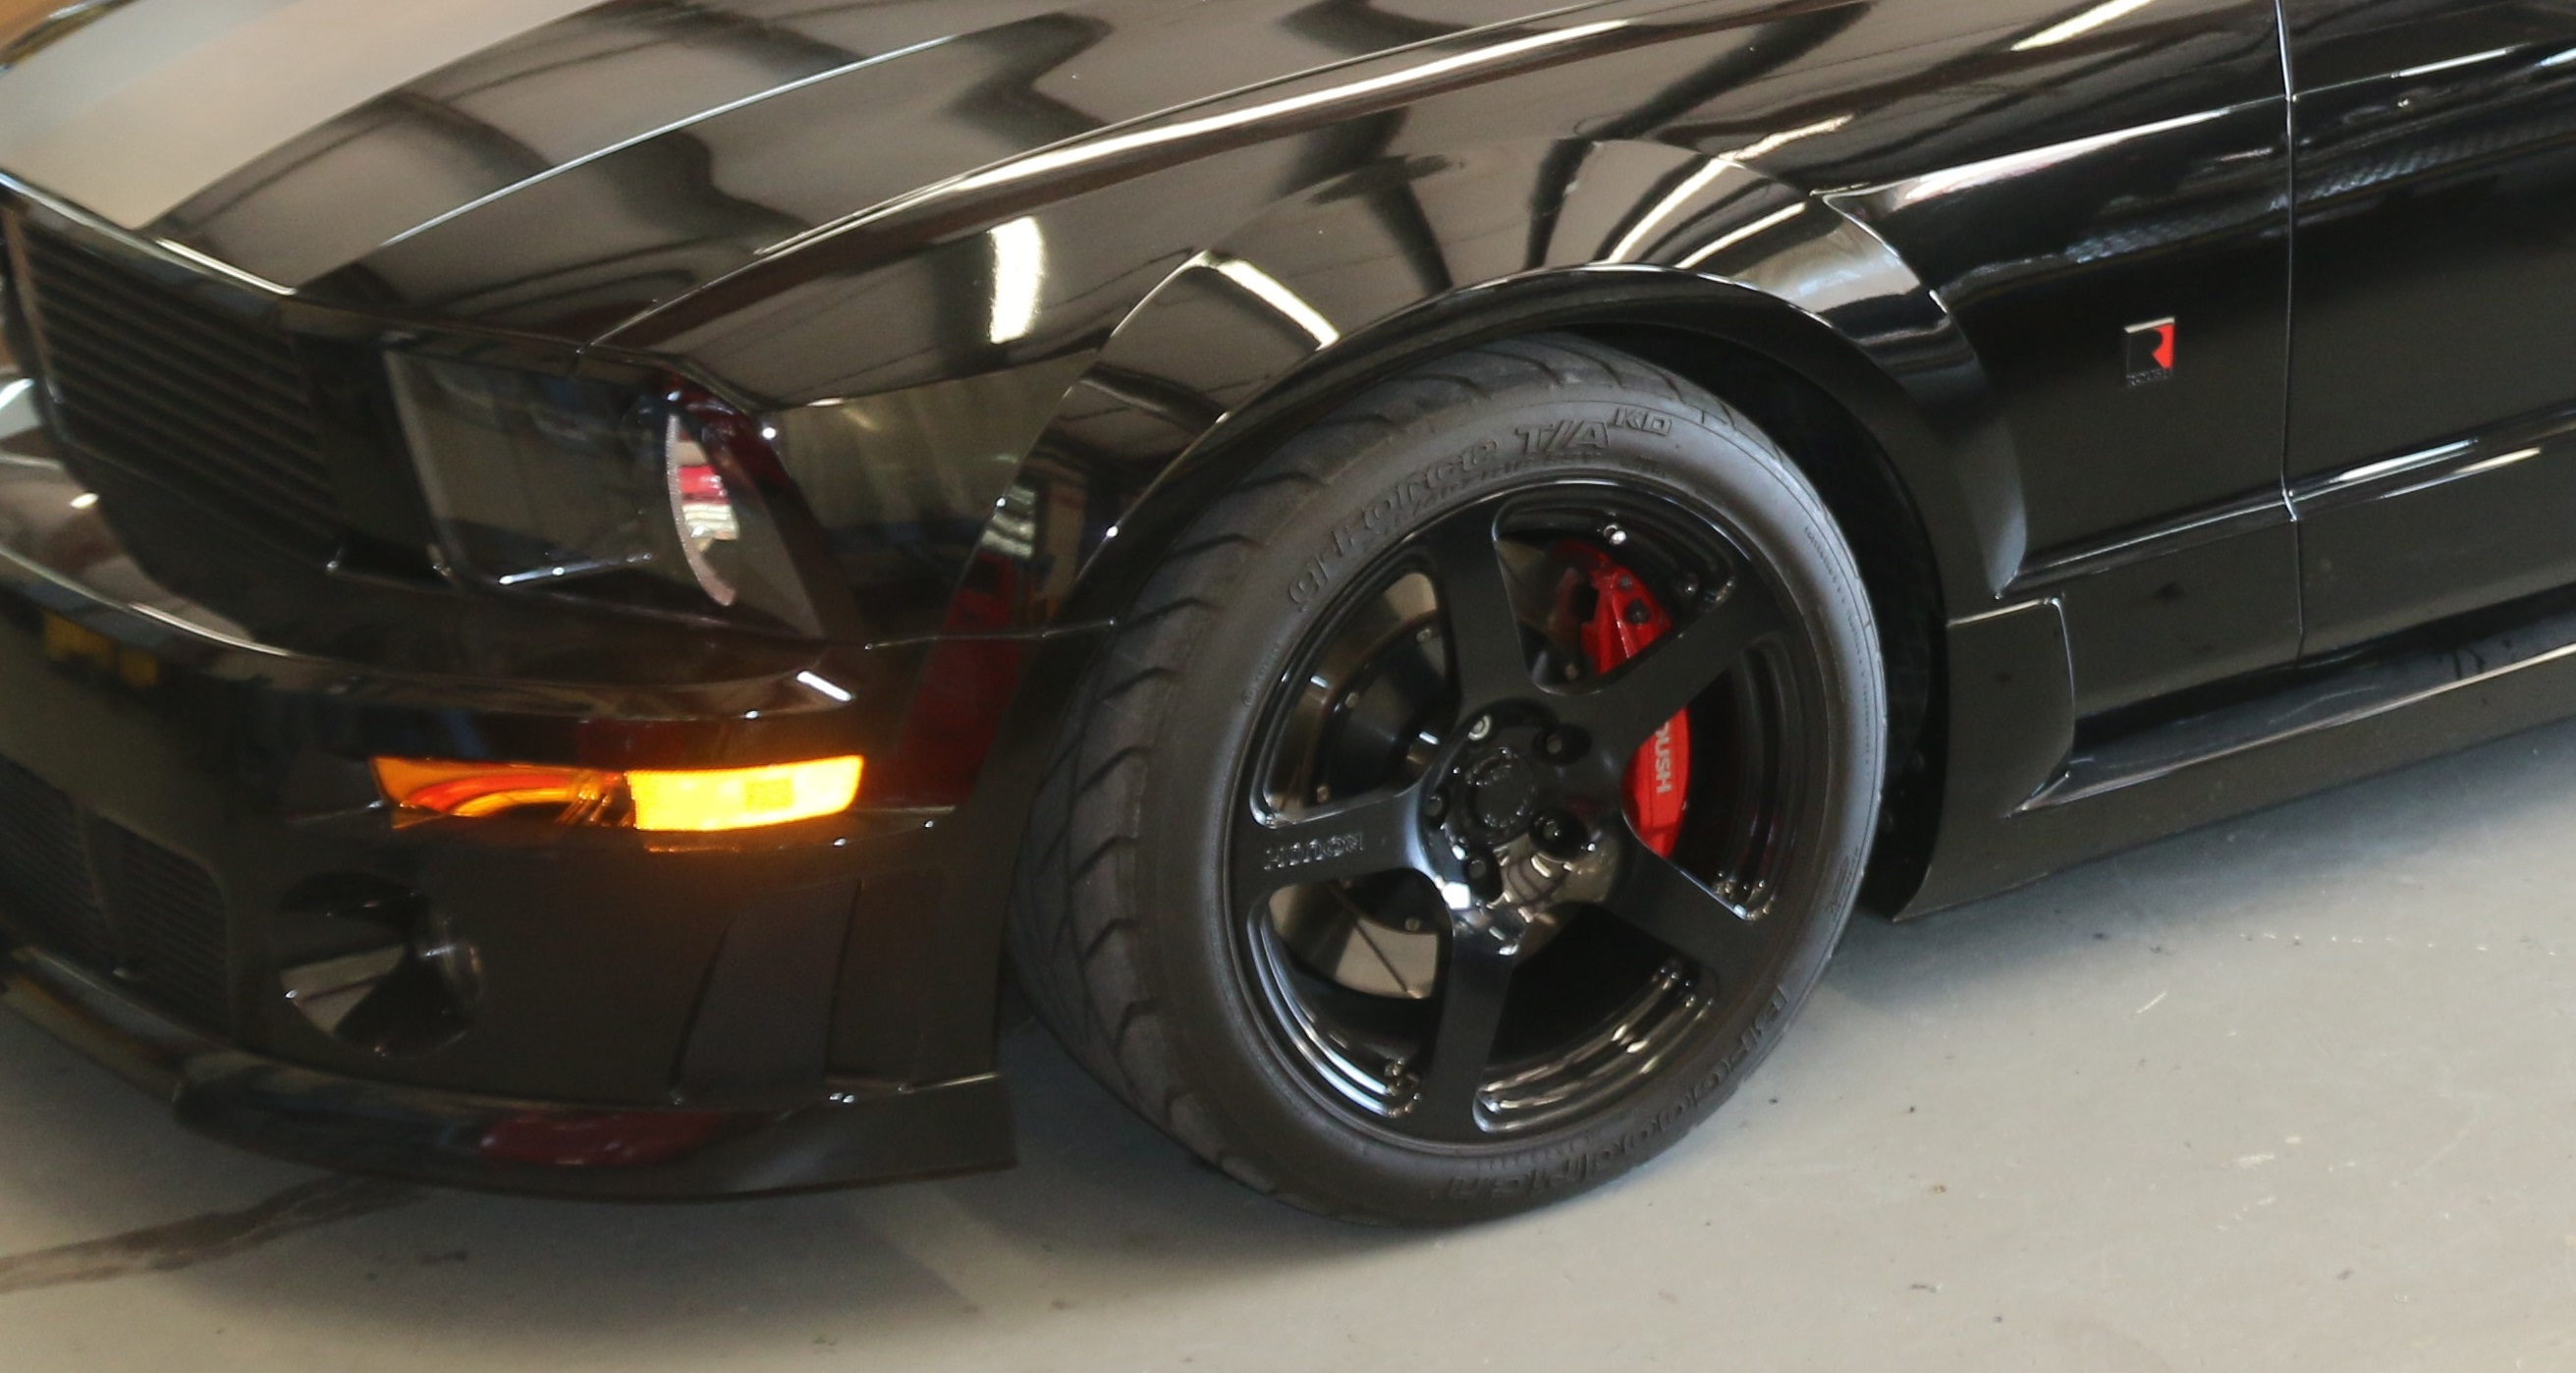 certified body shop wheel painting and powder coating in plano richardson mckinney allen frisco parker murphy dallas texas